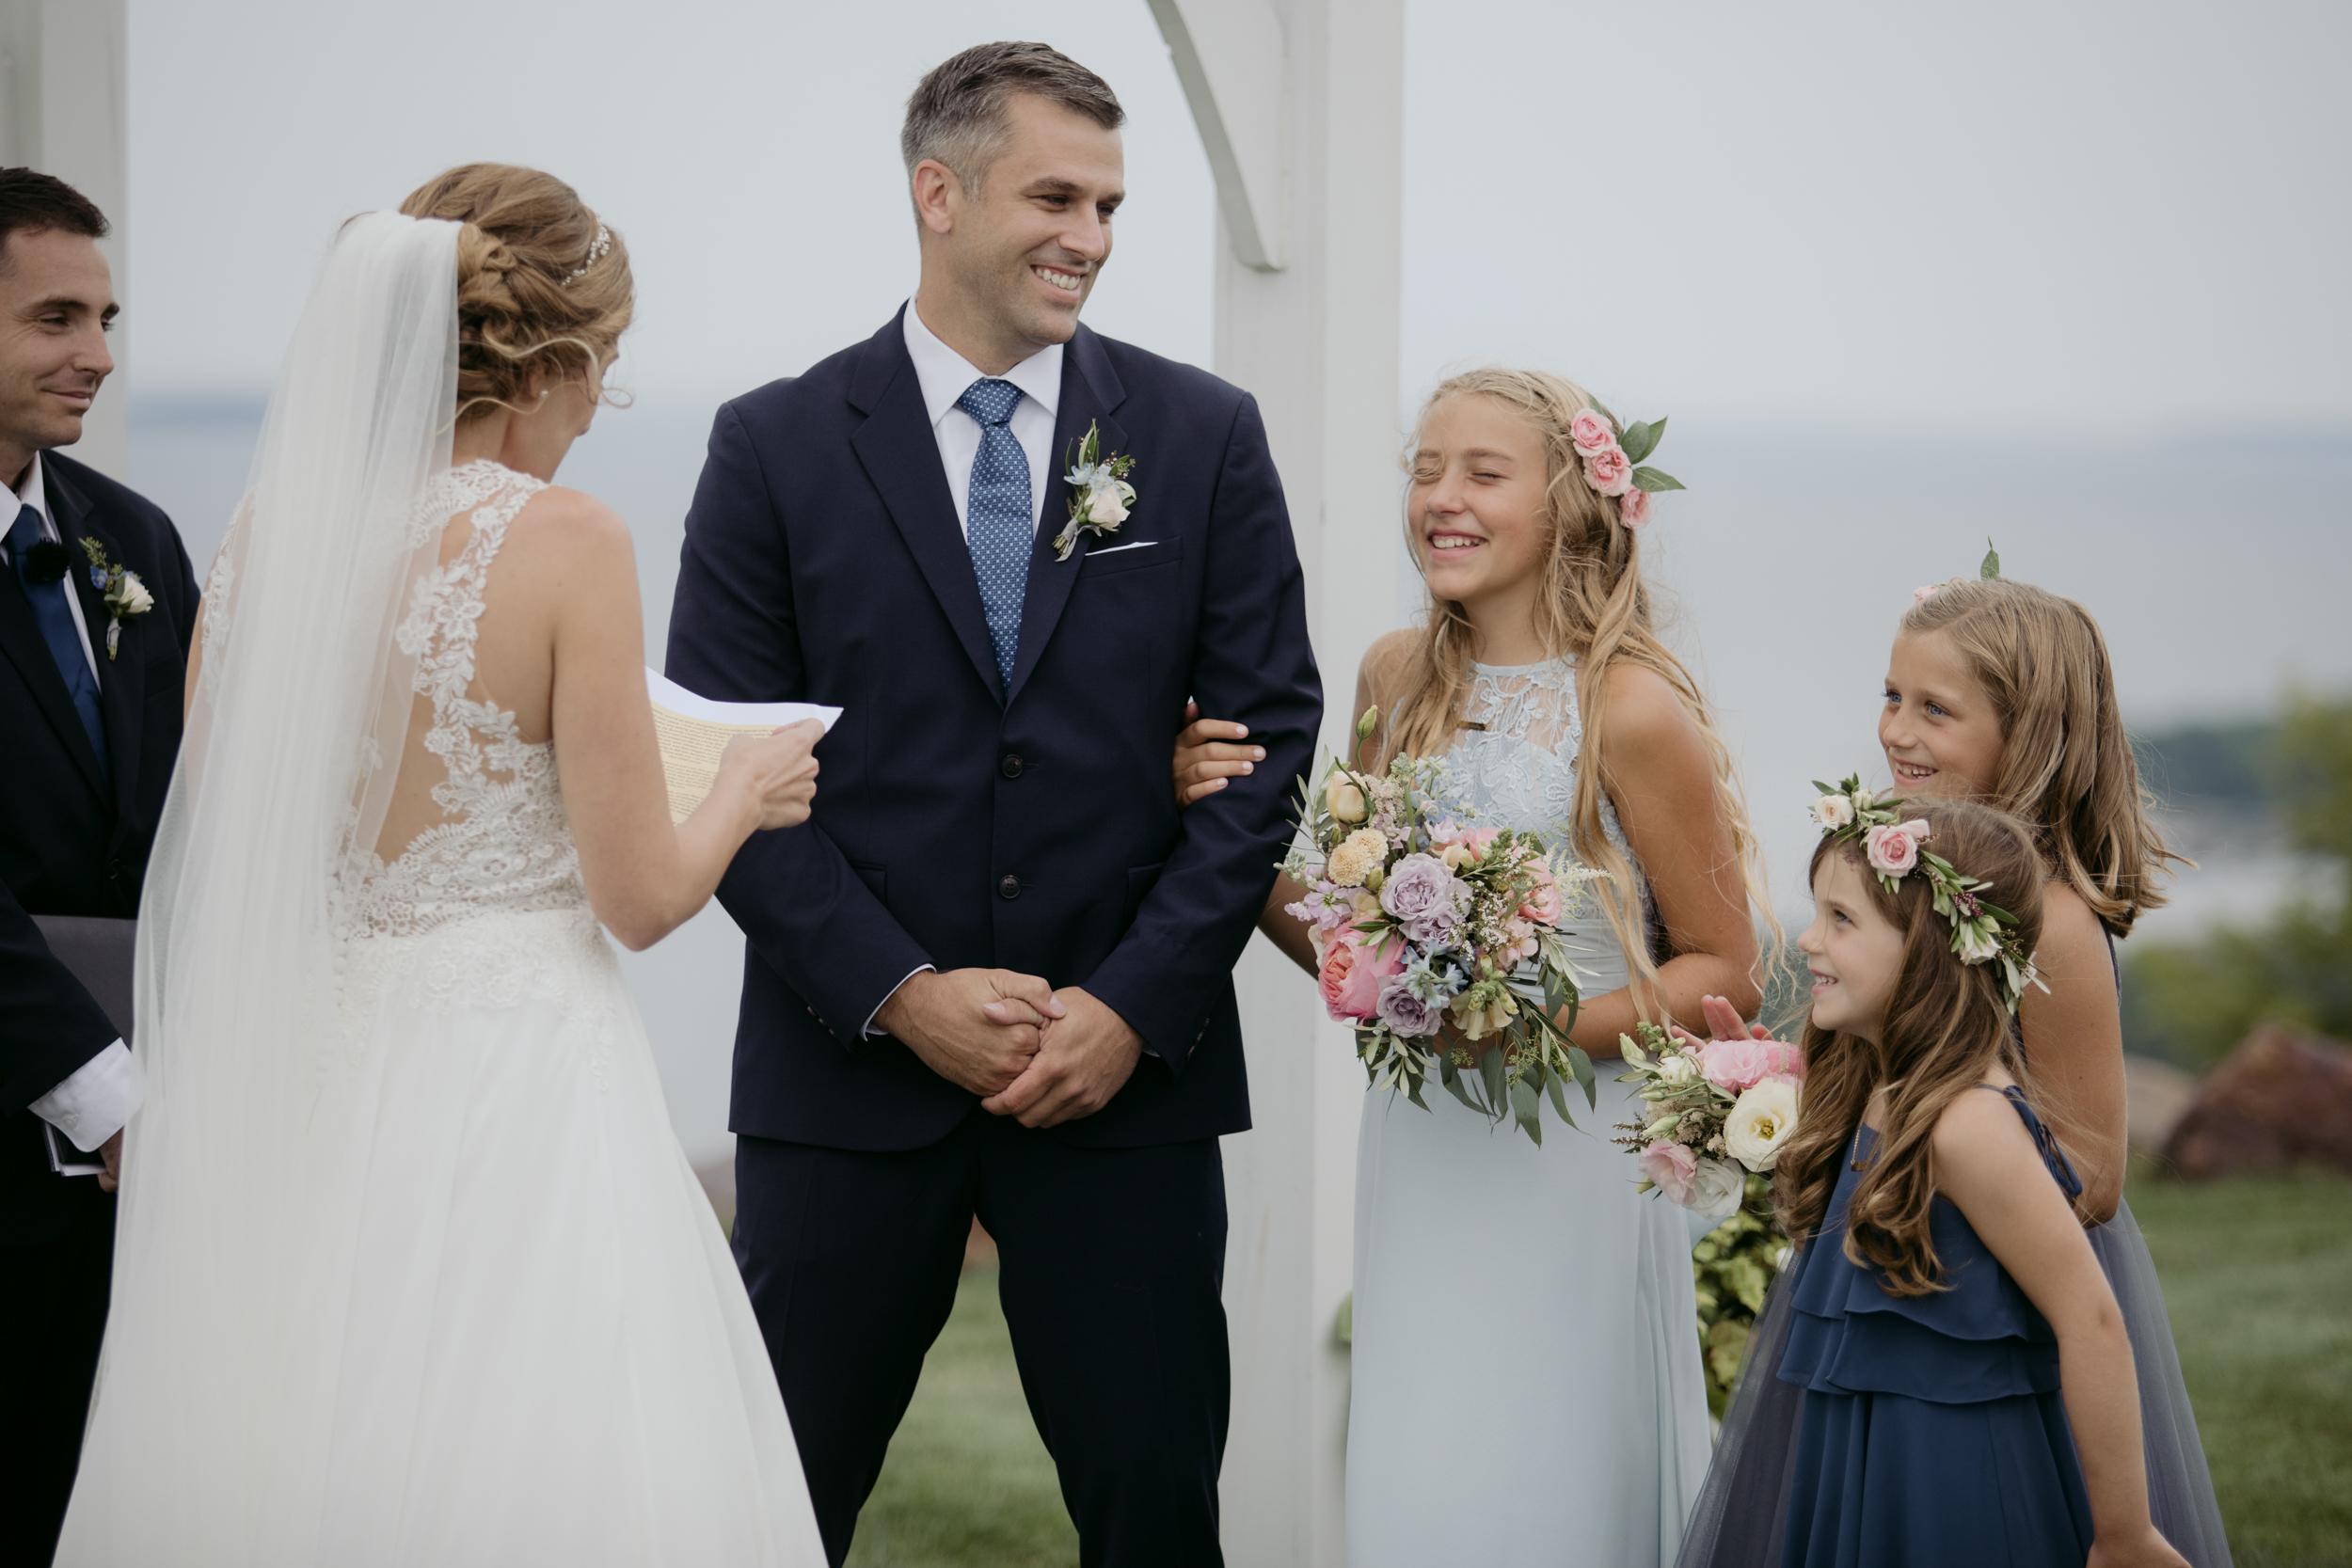 point_lookout_northport_Maine_Midcoast_wedding_leslie_justin-15.jpg